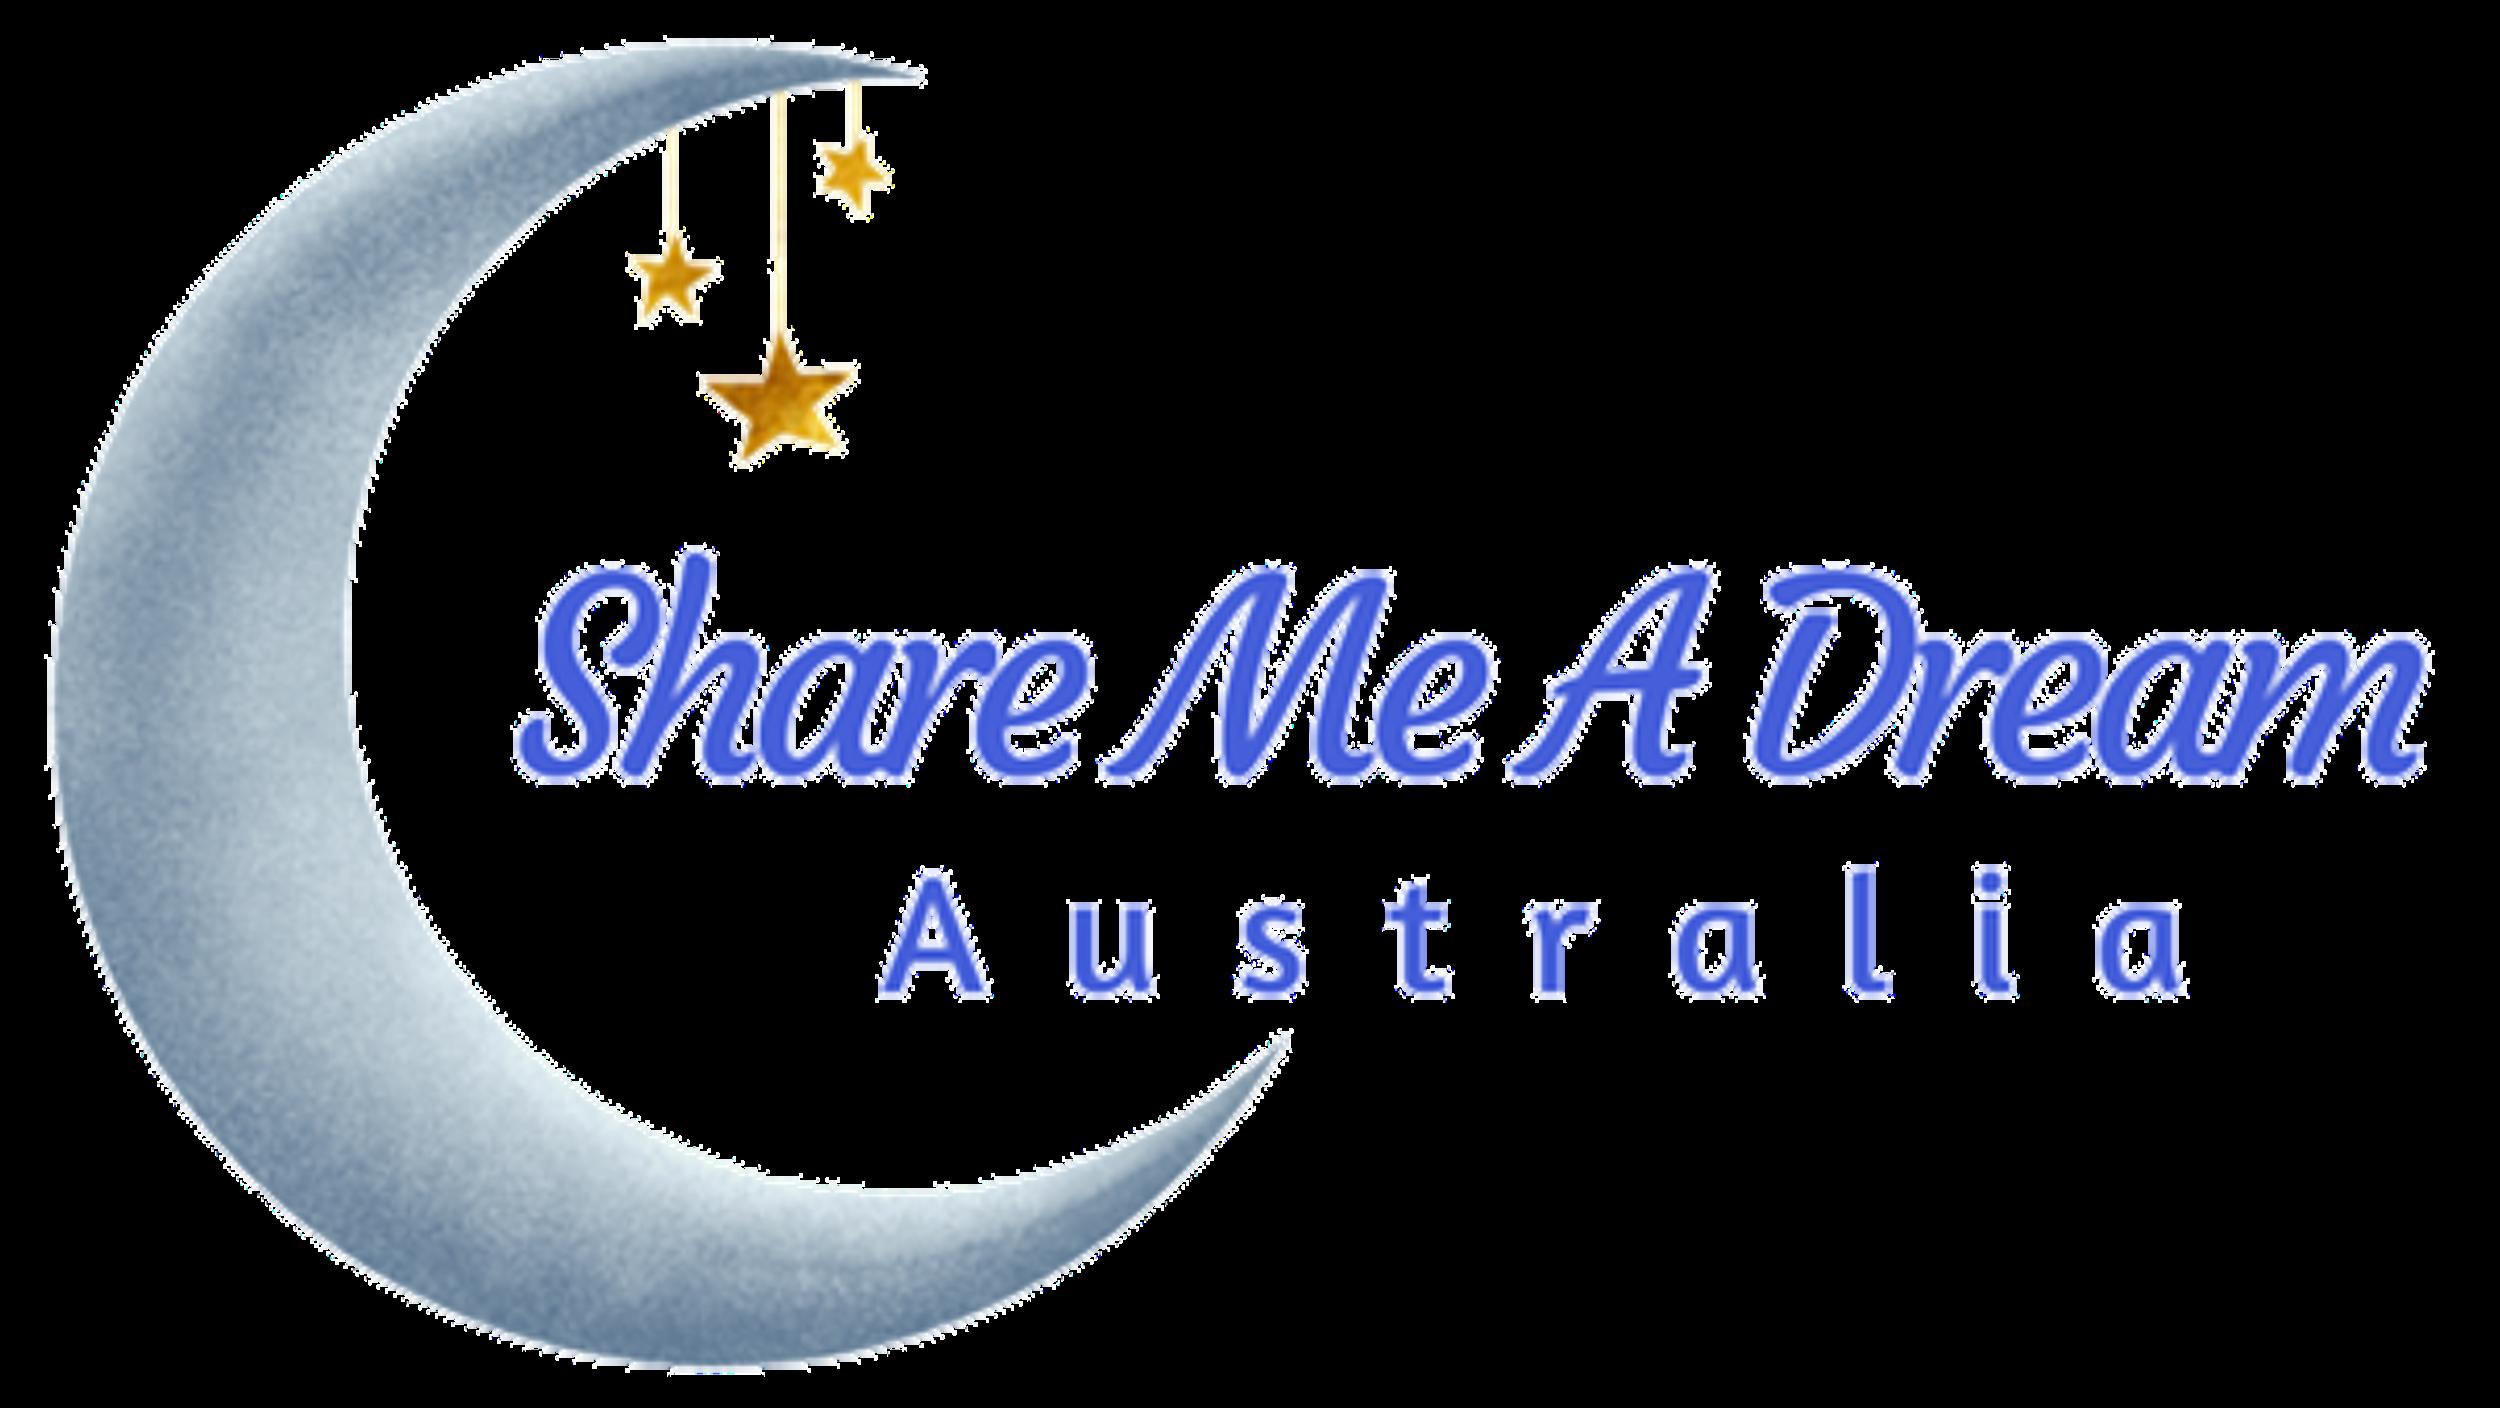 smad-charity-logo-melbourne-australia-2018-transparent.png